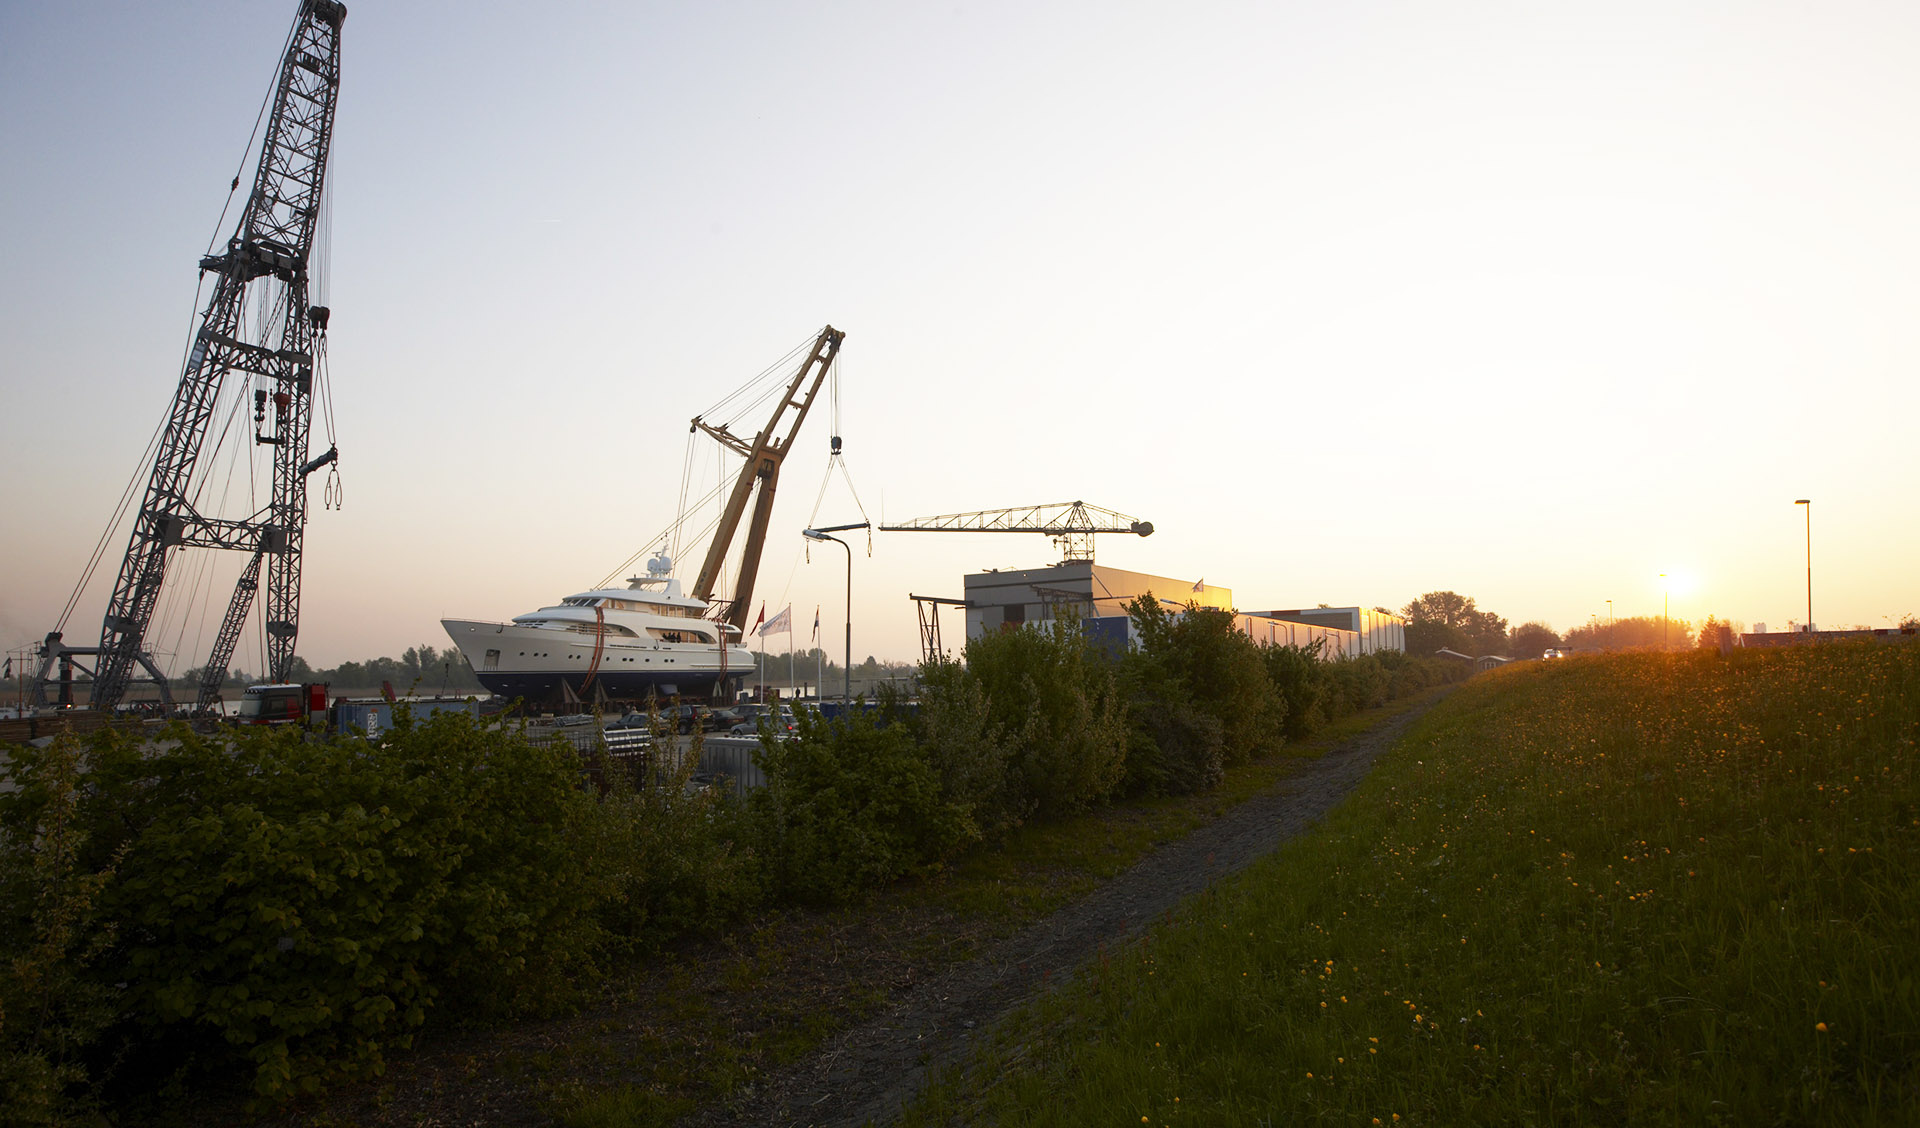 Moonen Shipyards BV - www.moonen.com - The Netherlands - +31 73 6210094